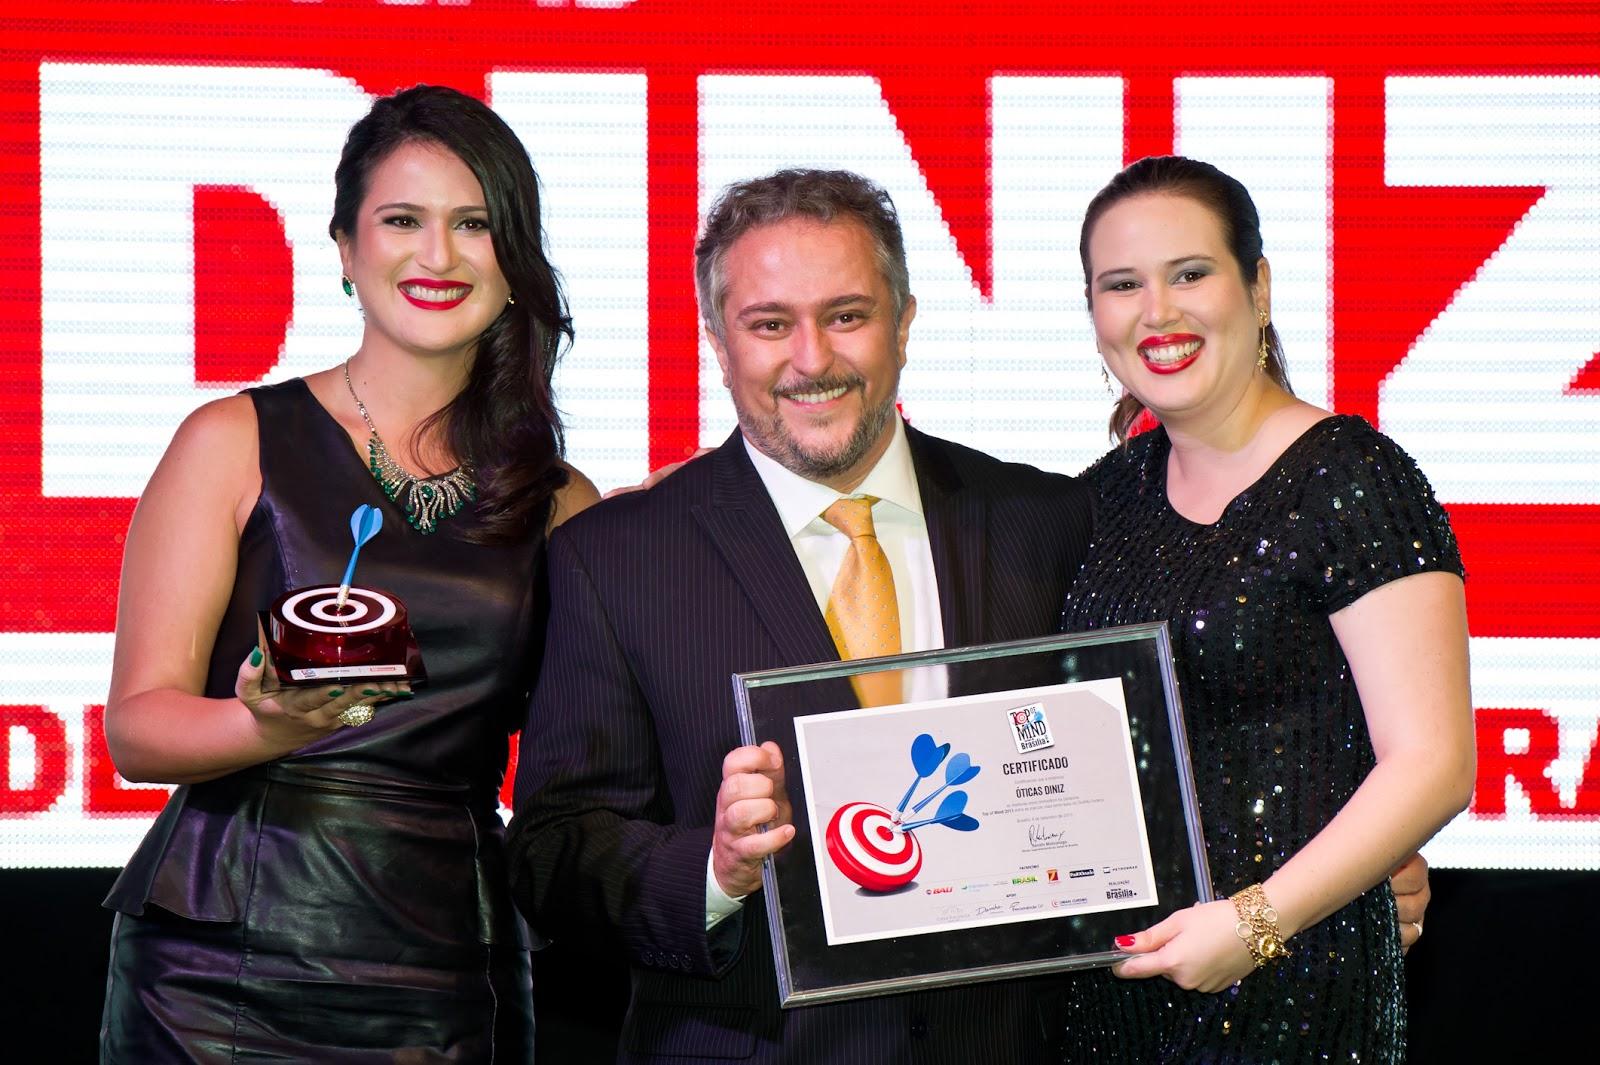 Óticas Diniz recebe prêmio Top Of Mind - magazine 23a58d6178